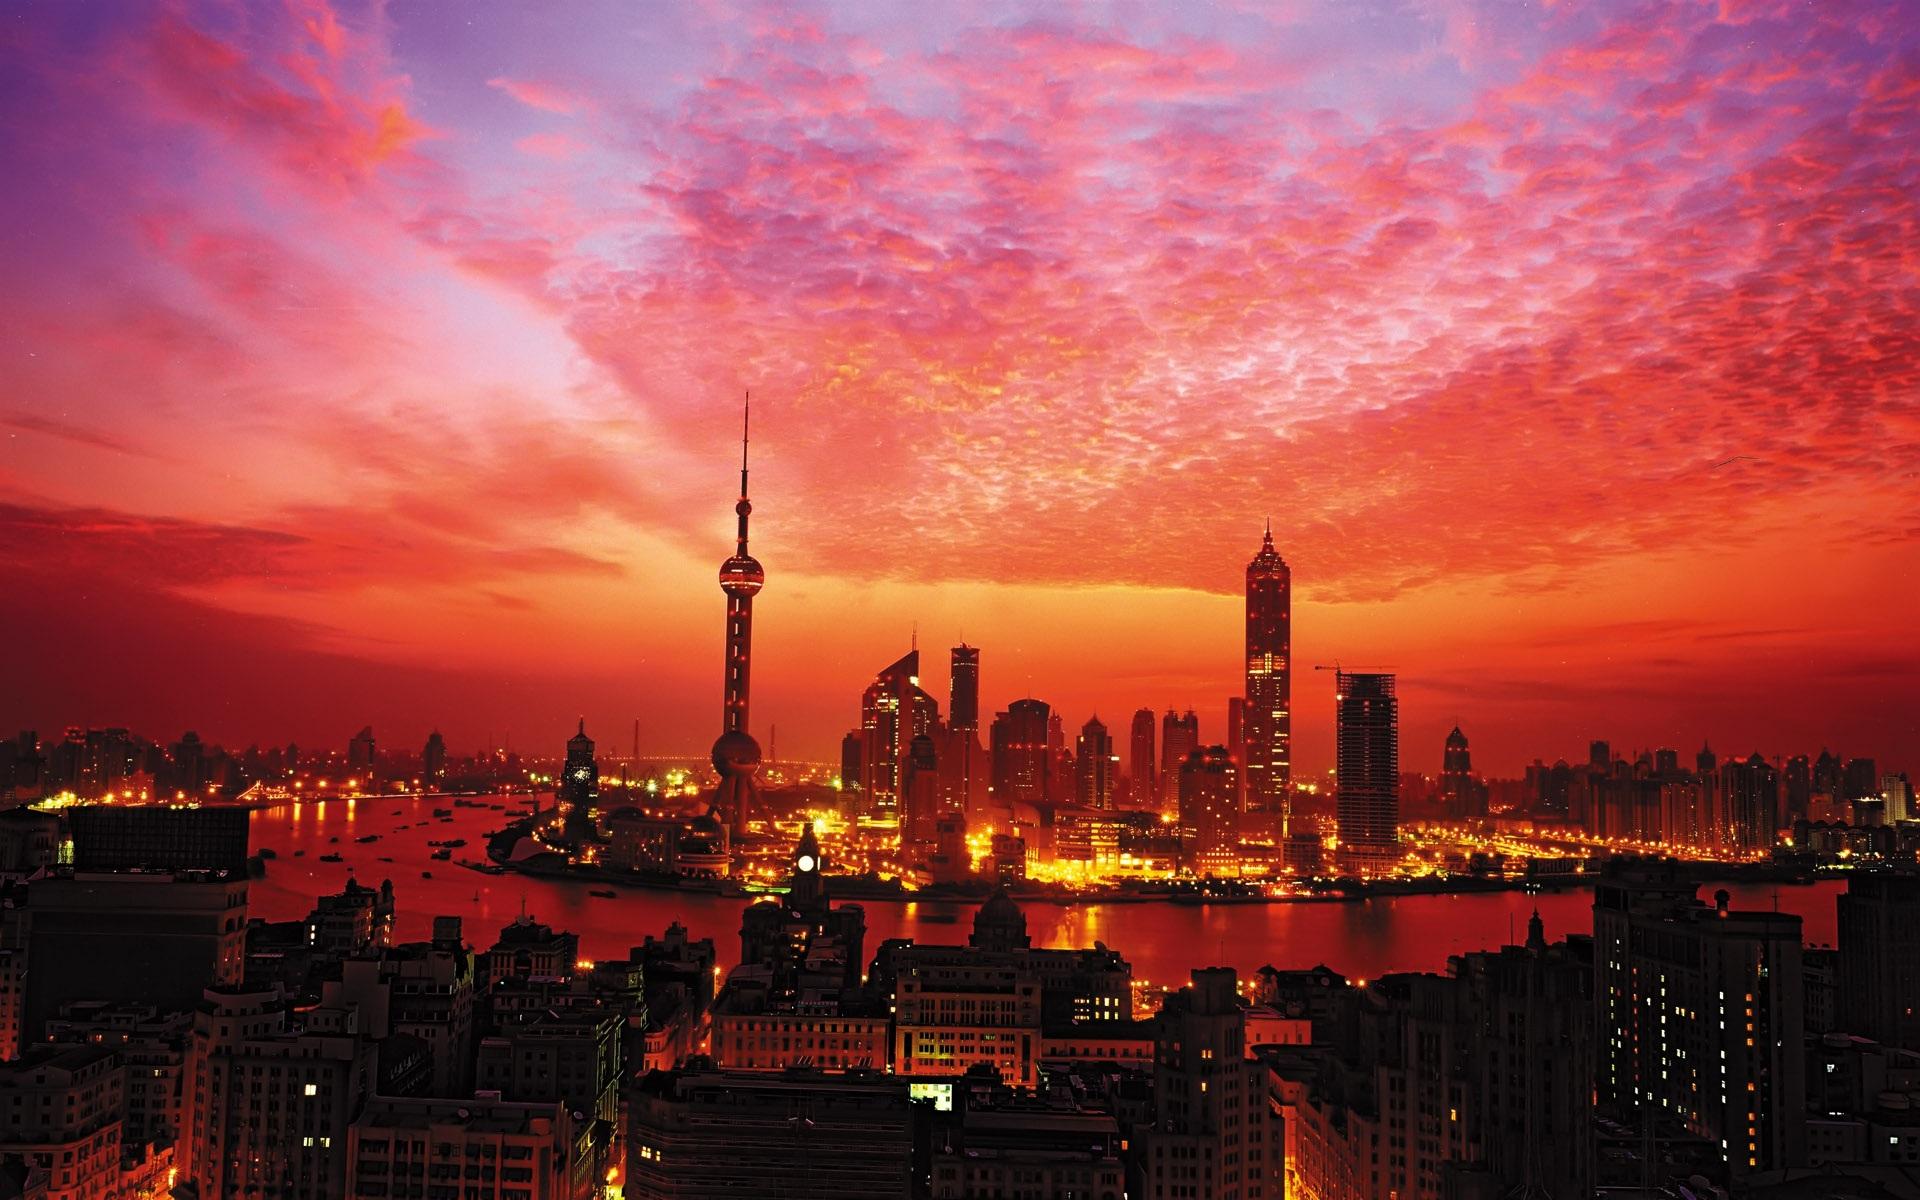 Sunset-in-Shanghai_1920x1200